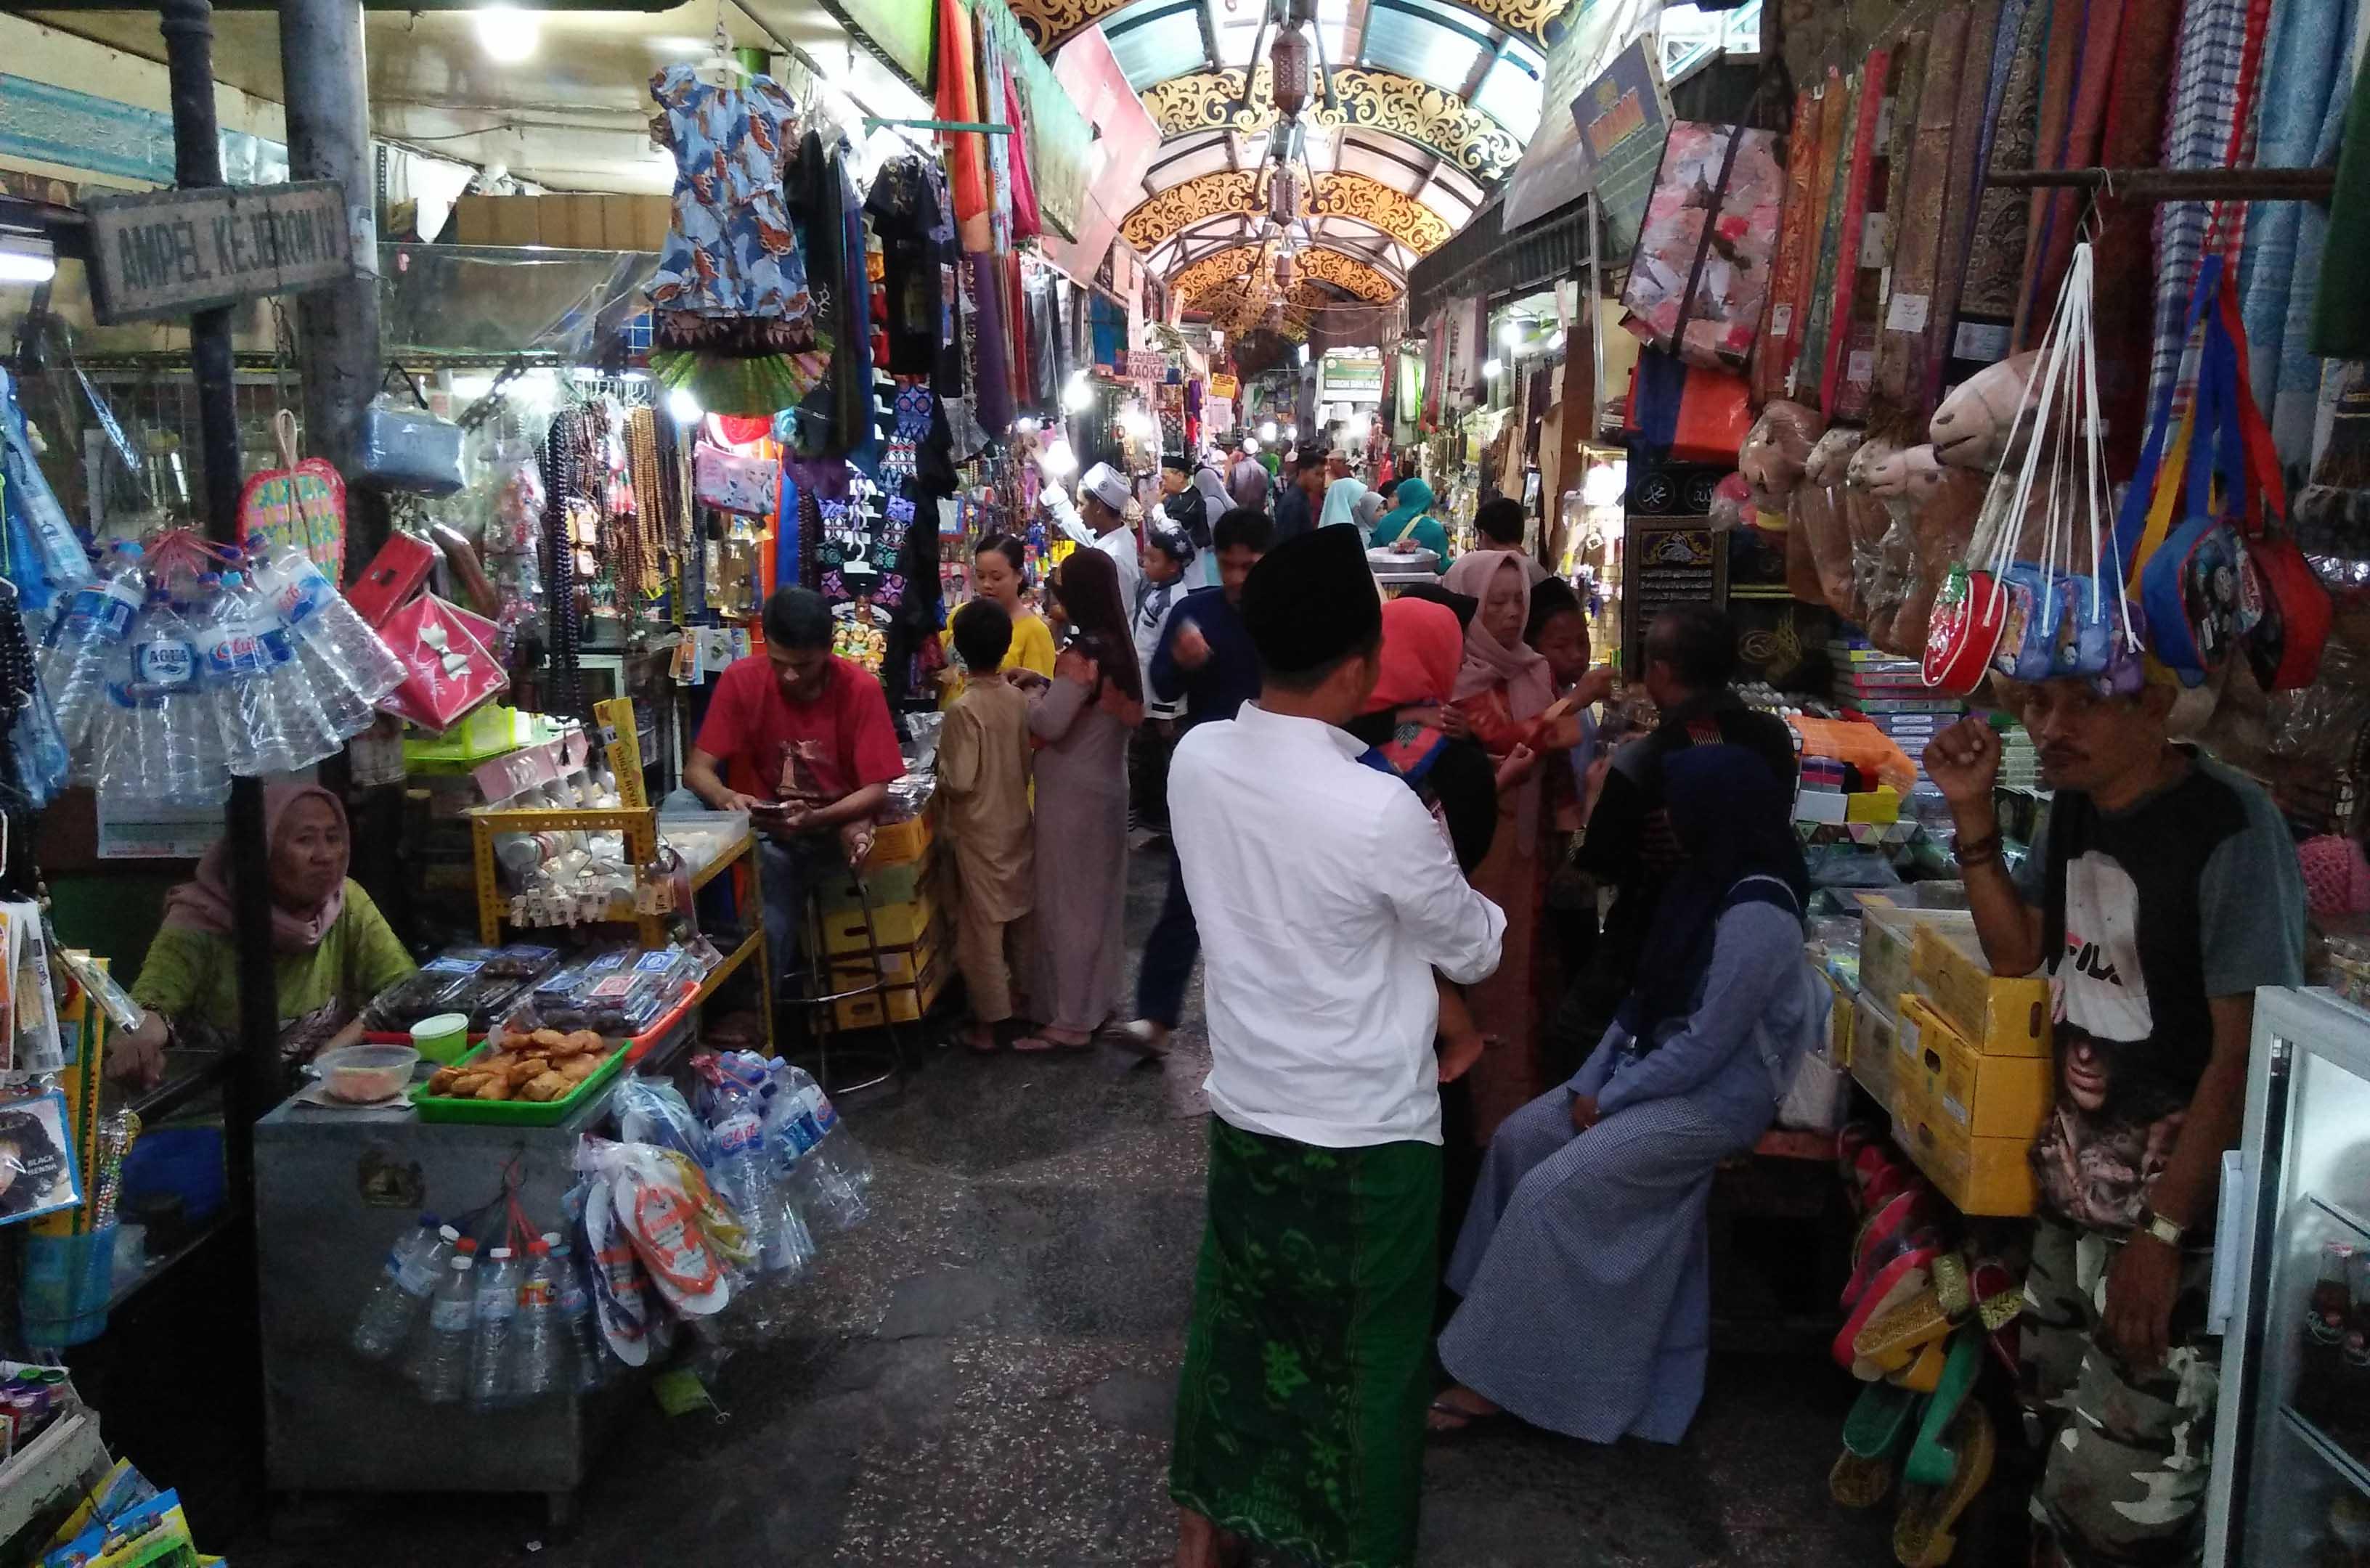 Pemkot Surabaya Diminta Menata Kawasan Wisata Ampel